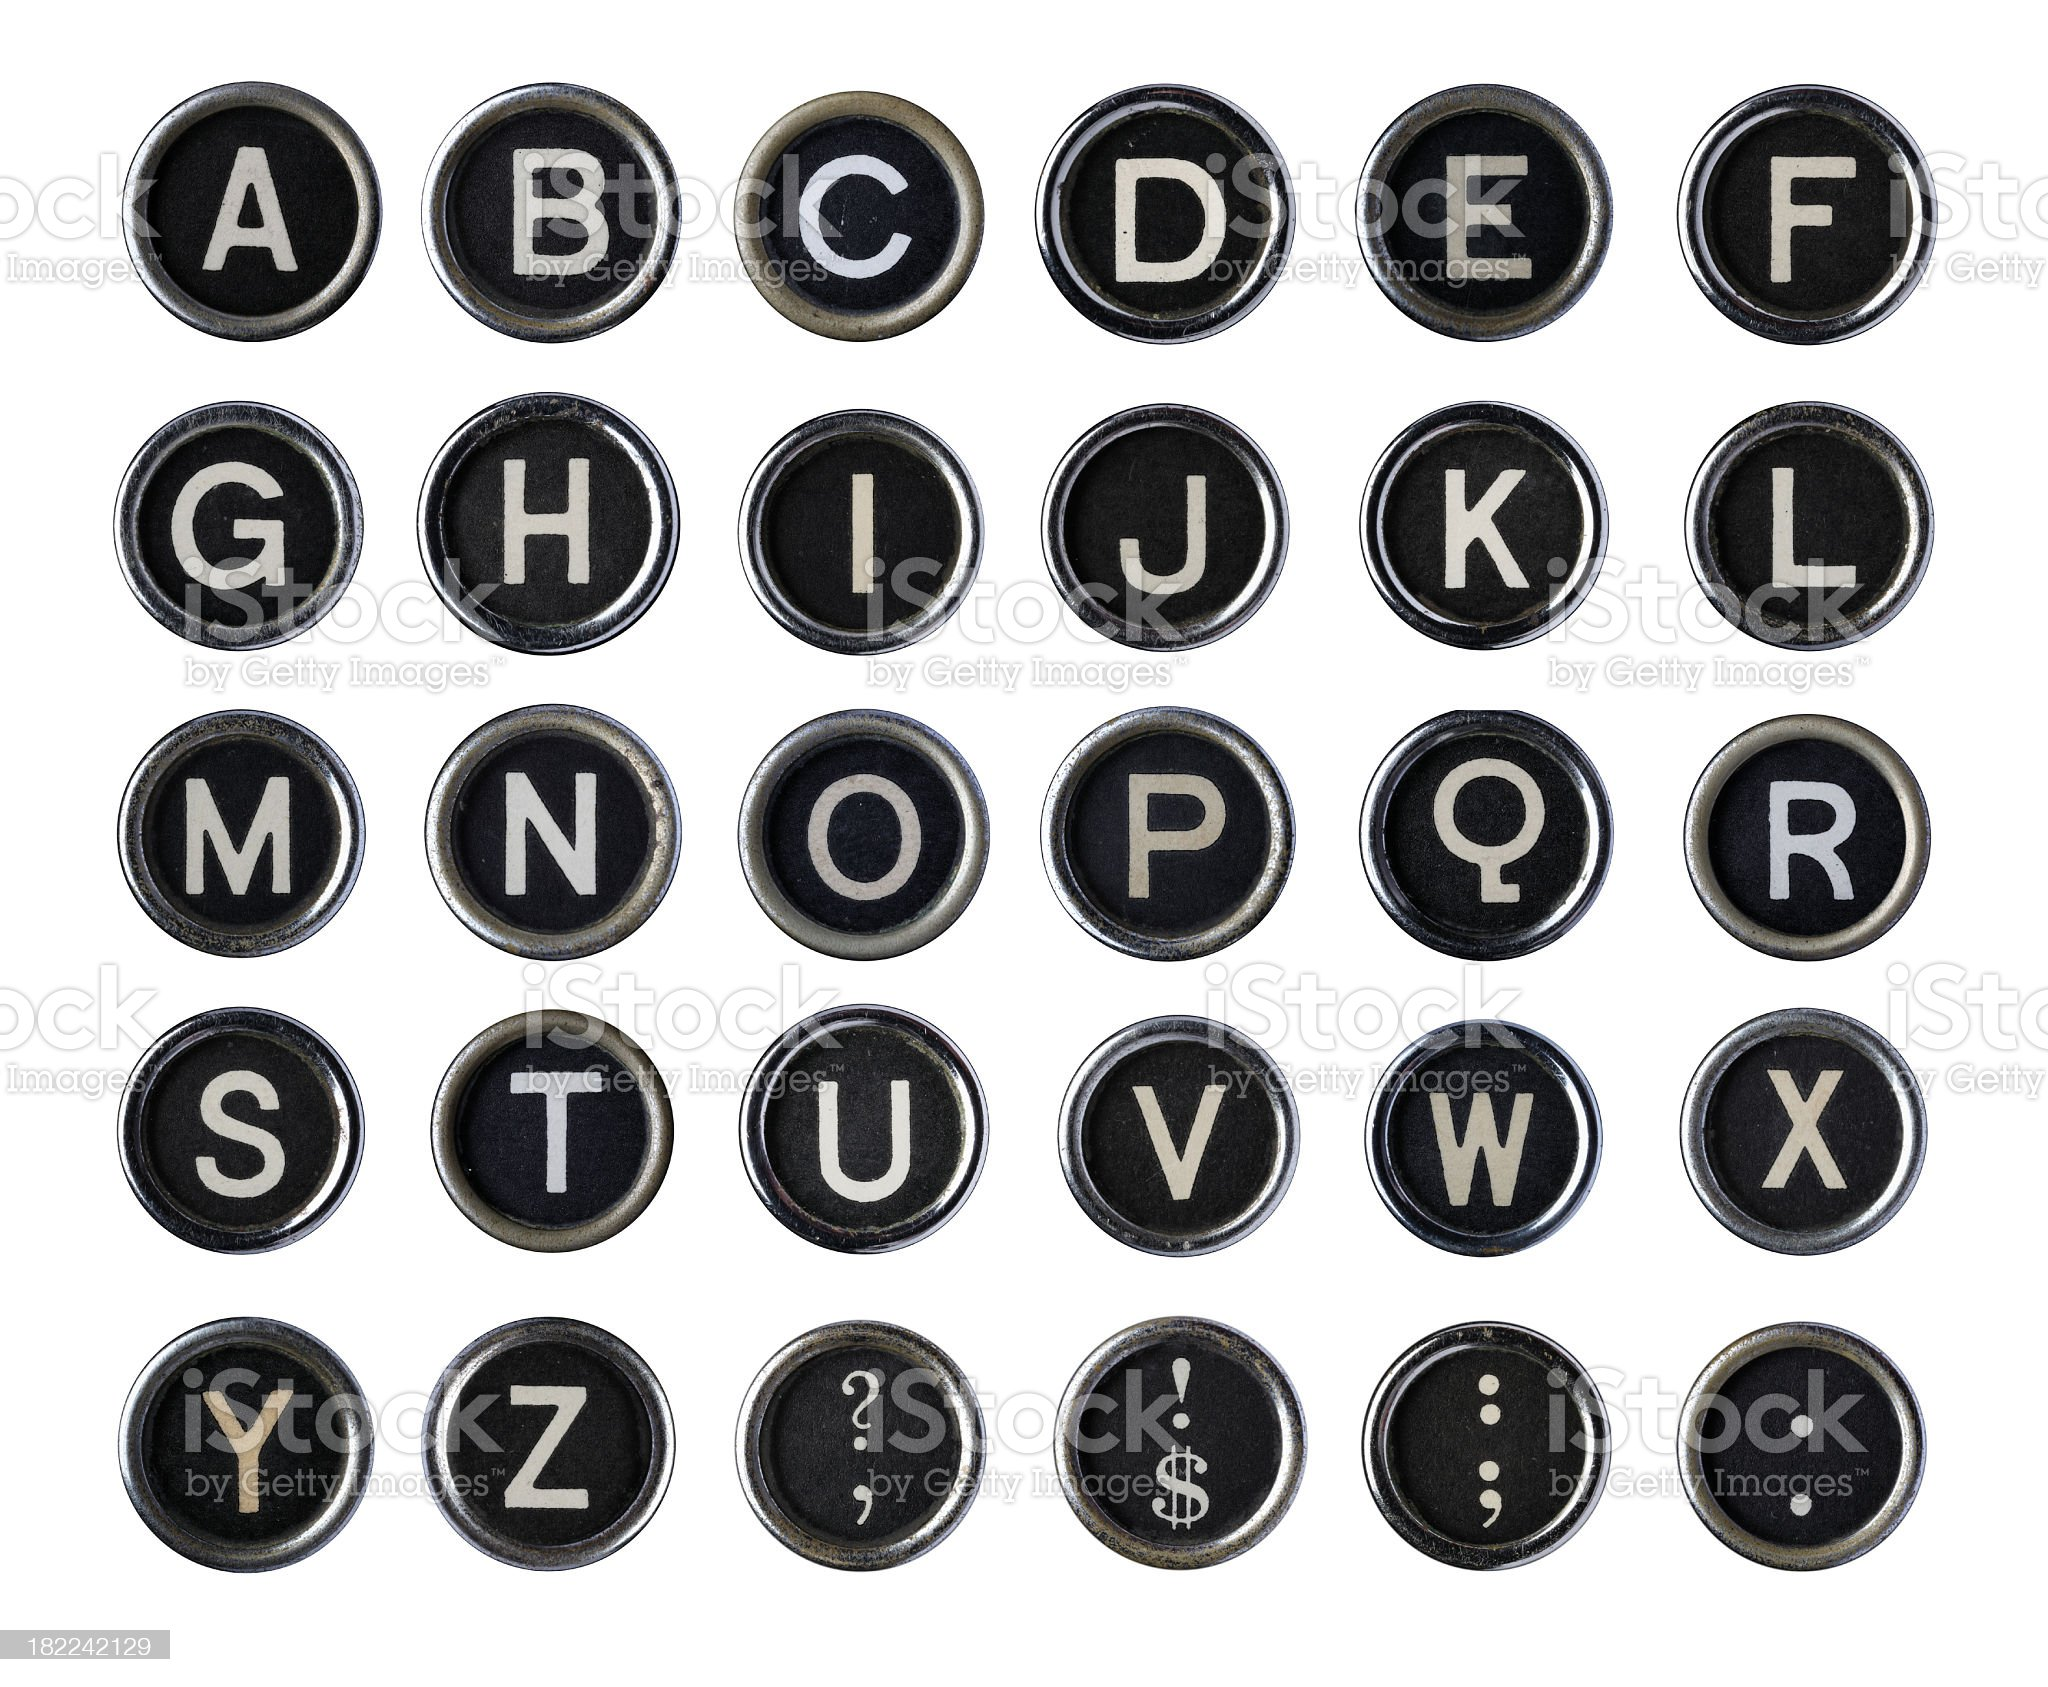 Vintage Typewriter Alphabet royalty-free stock photo